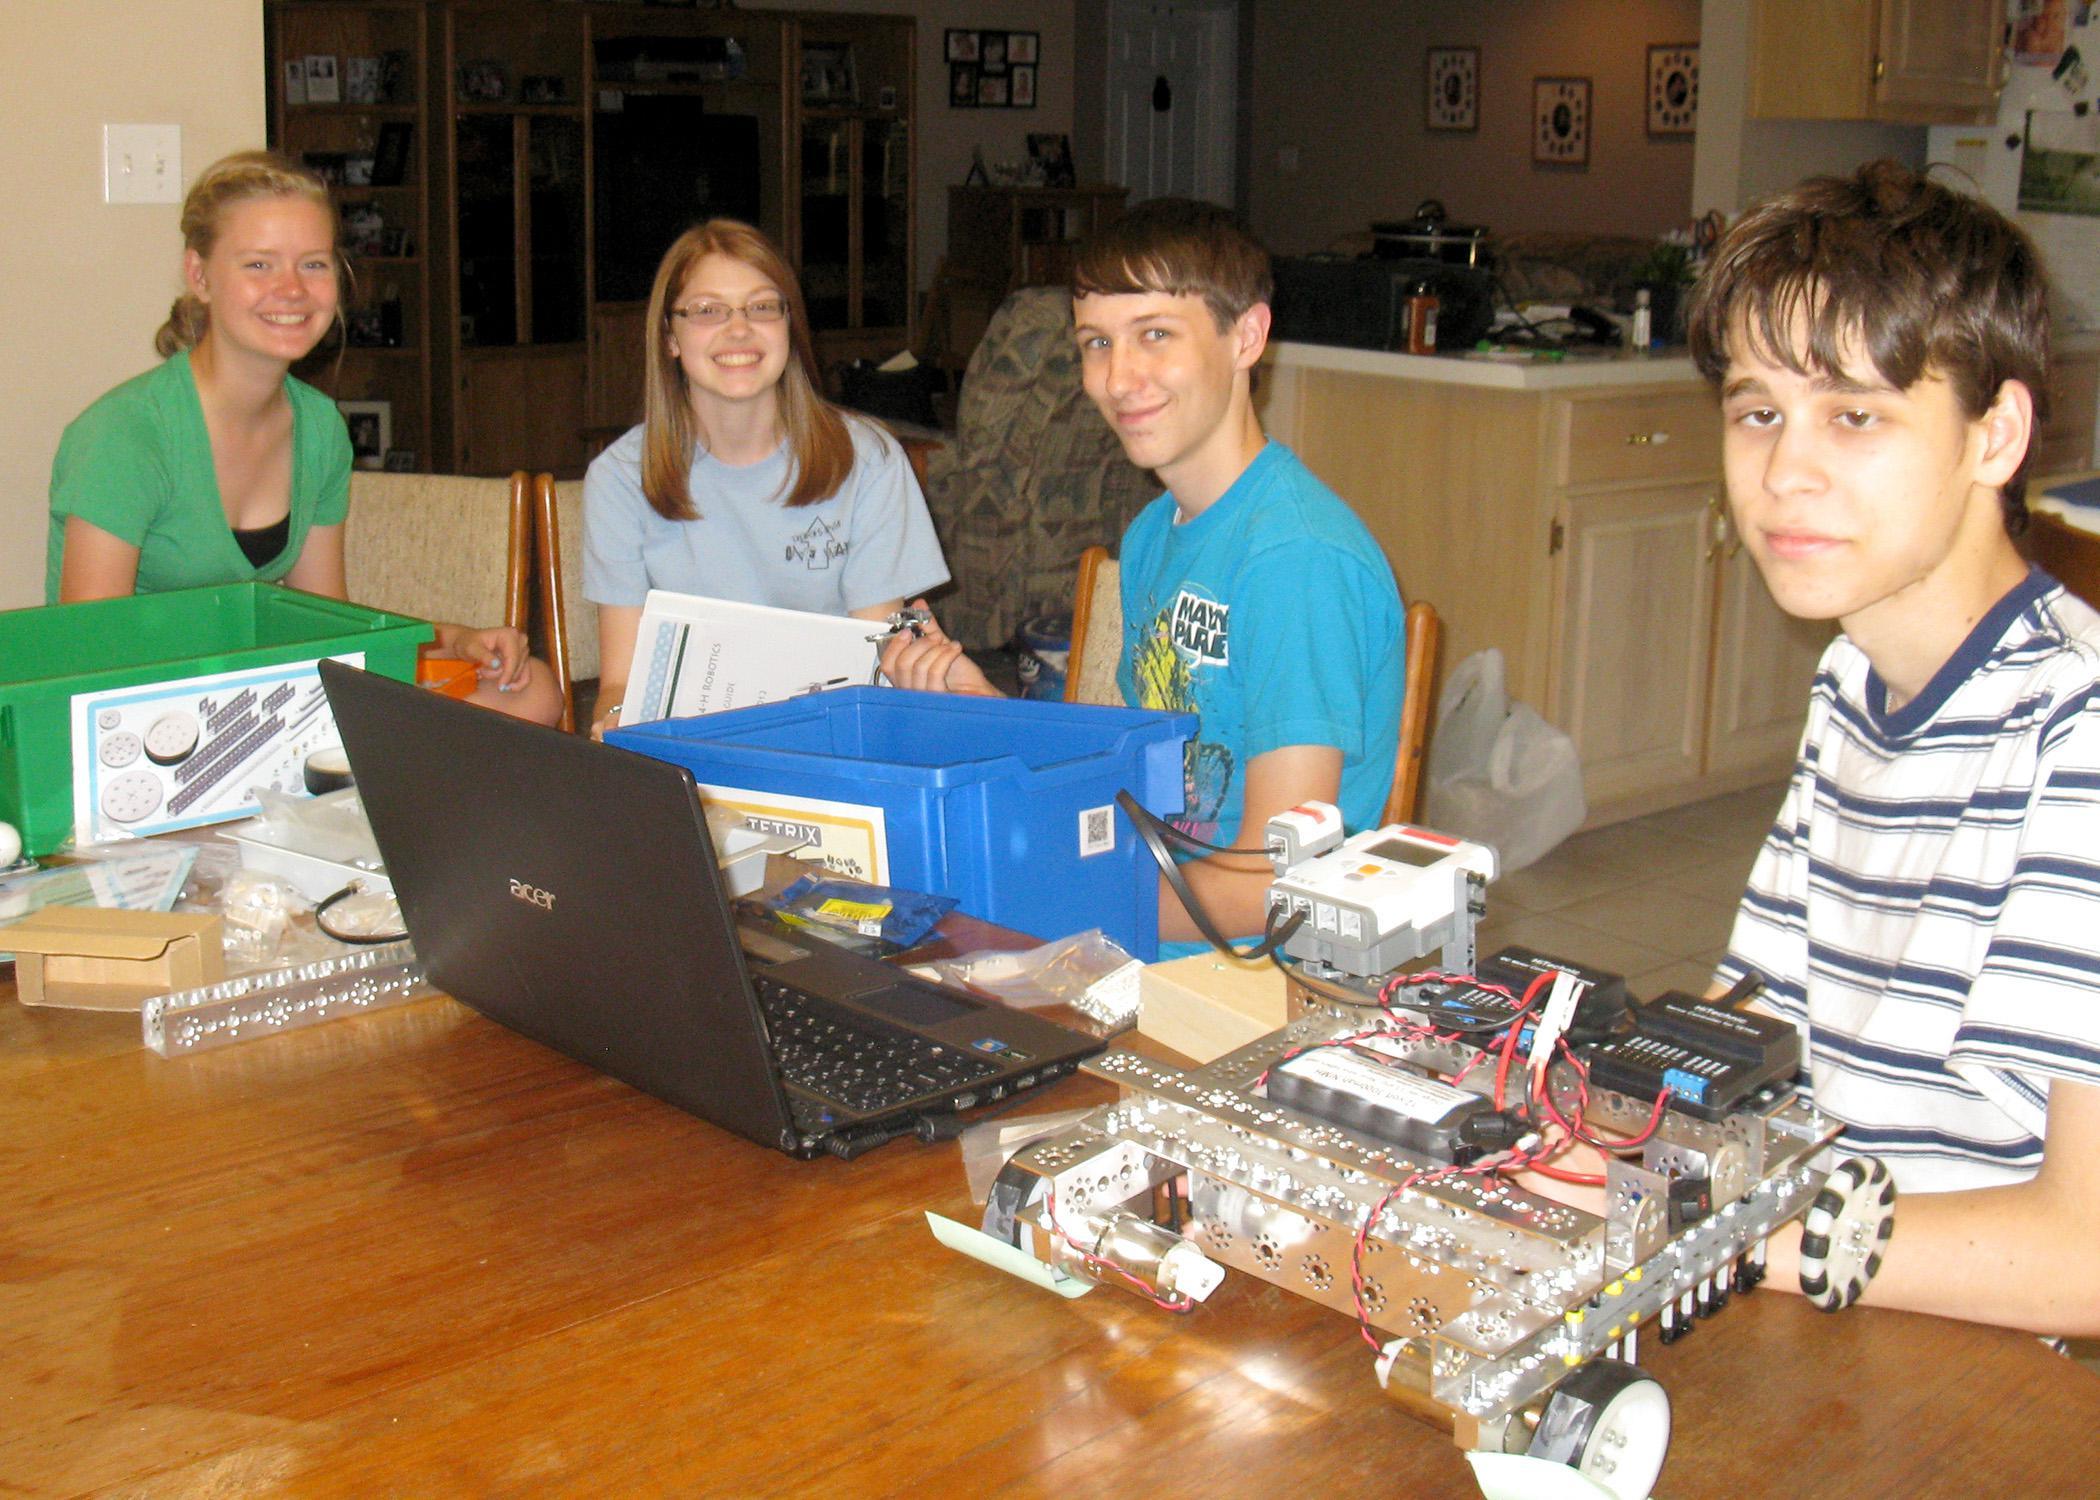 The Pearl River County senior 4-H Robotics team, from left Elsa Schmitz, Emily Bordelon, Bradley Guillot and Eric Bordelon, plans robot construction to prepare for an annual robotics contest. (Submitted Photo)